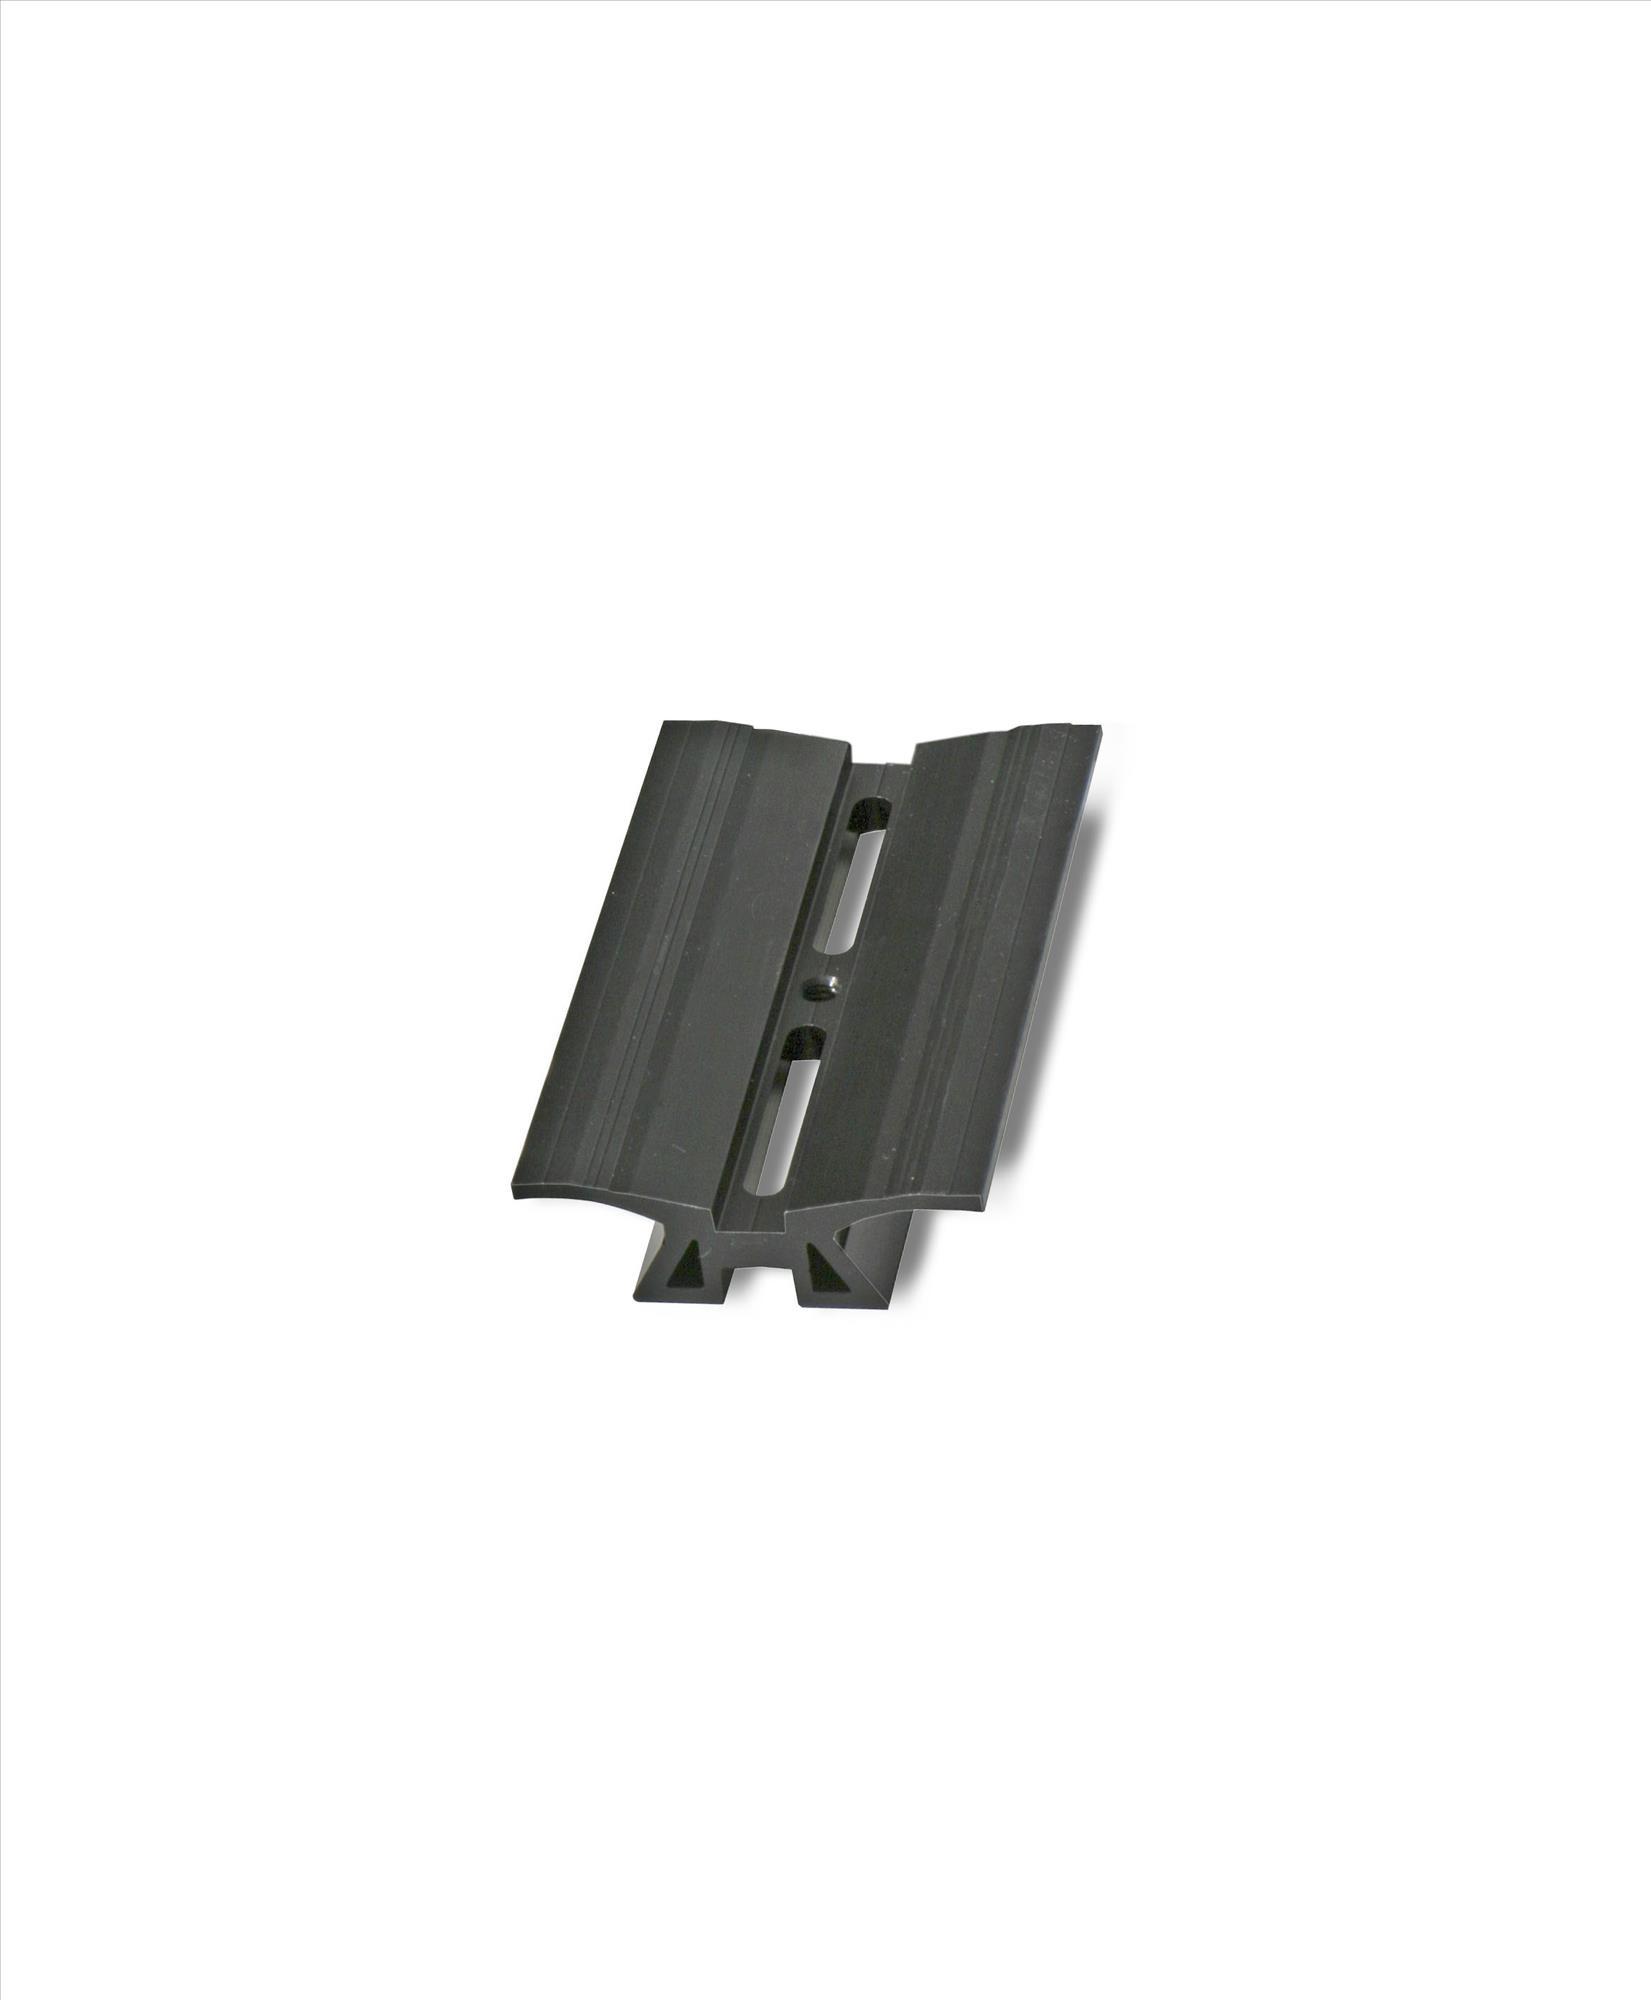 Baader Z(AP)-120 Dove tail bar, 120mm